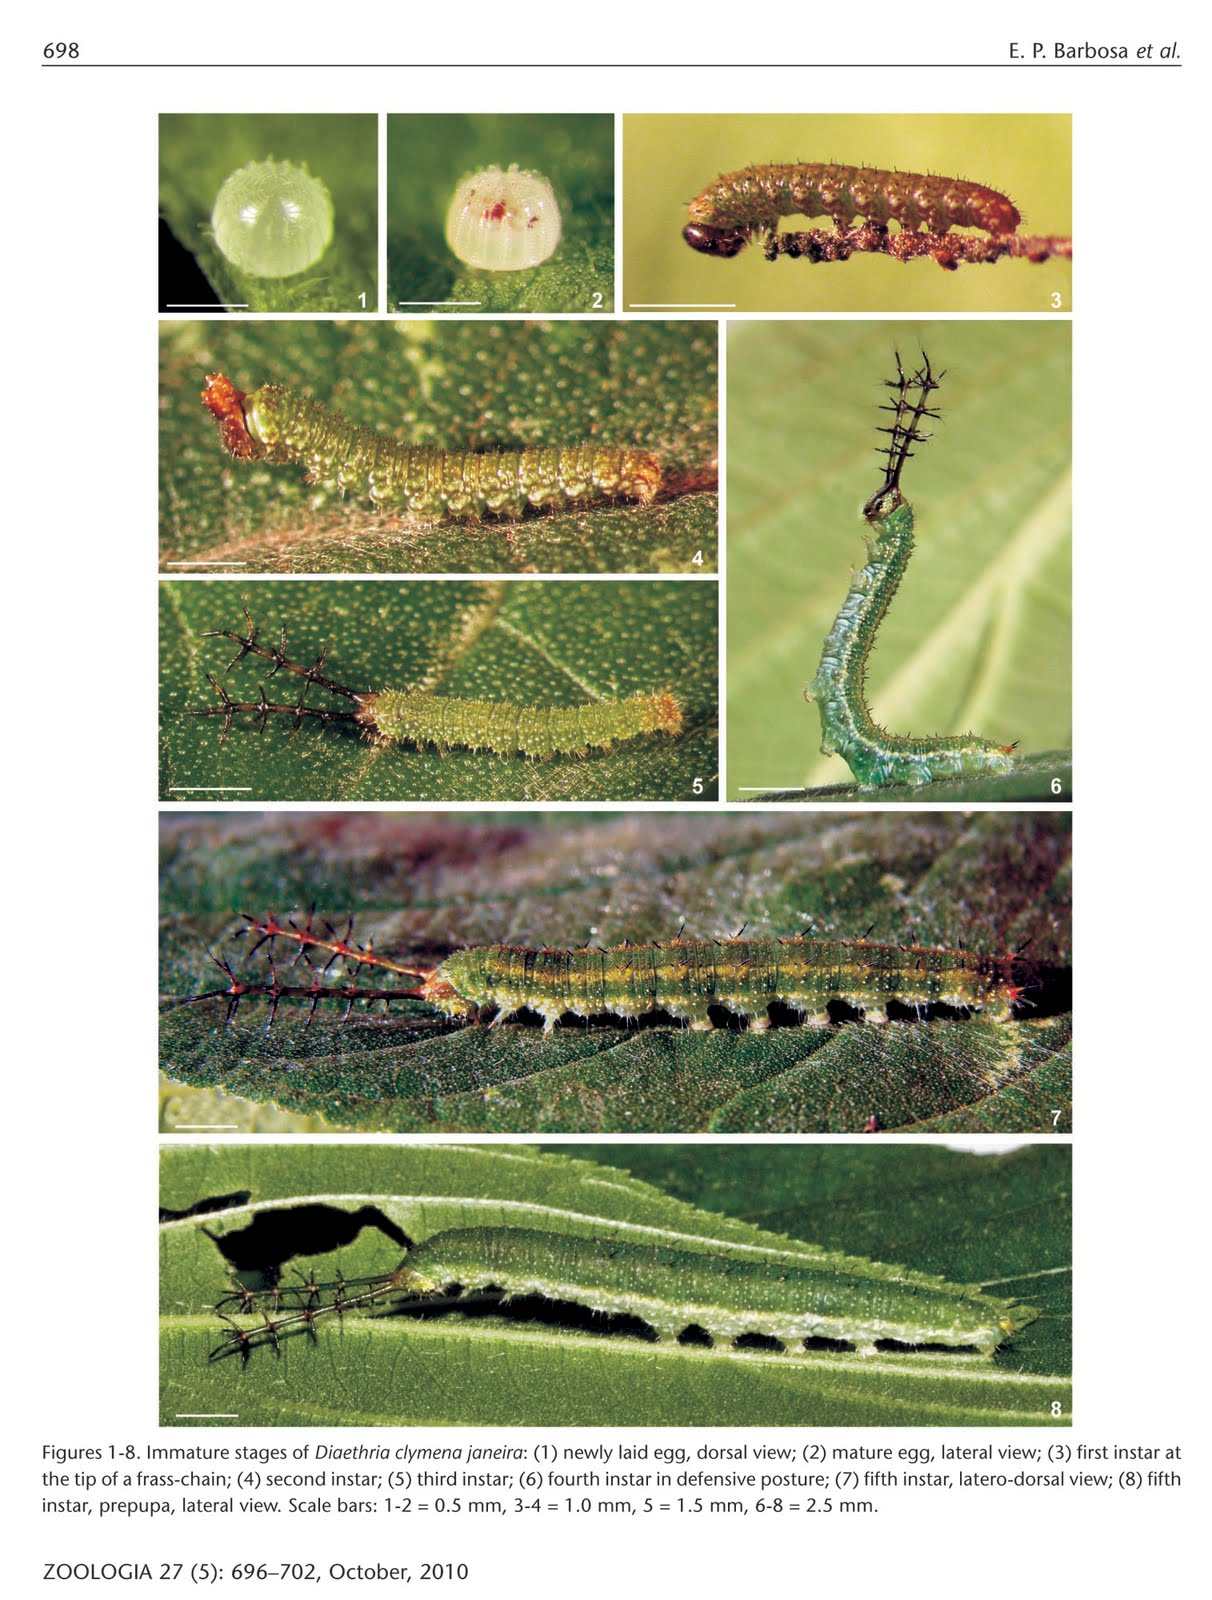 88 butterfly diaethria clymena